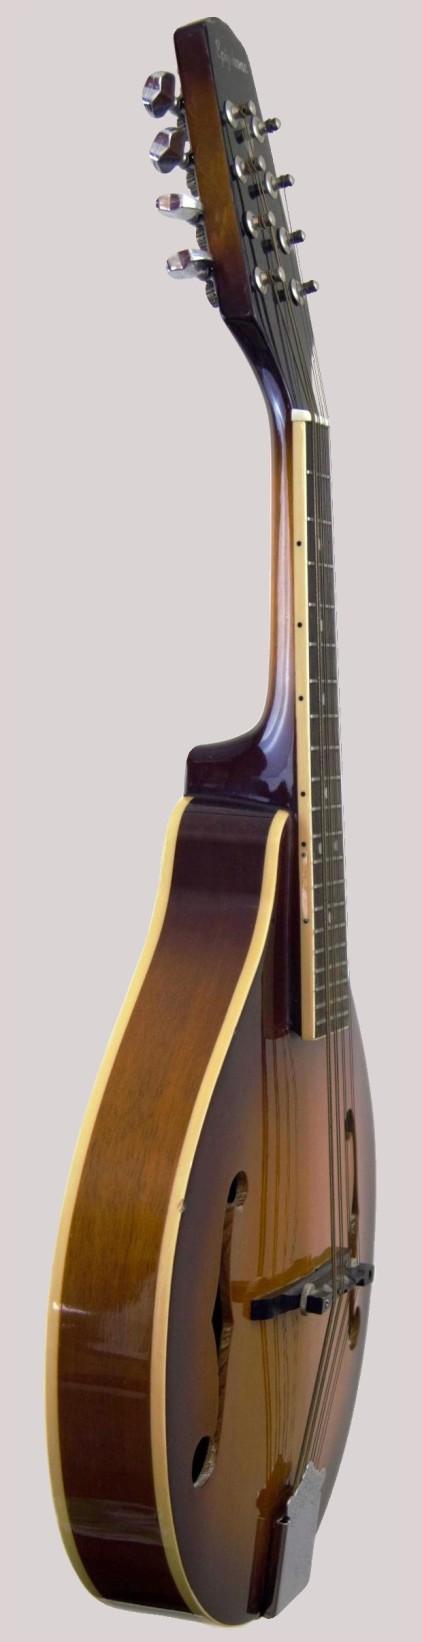 gibson epiphone a type mandolin